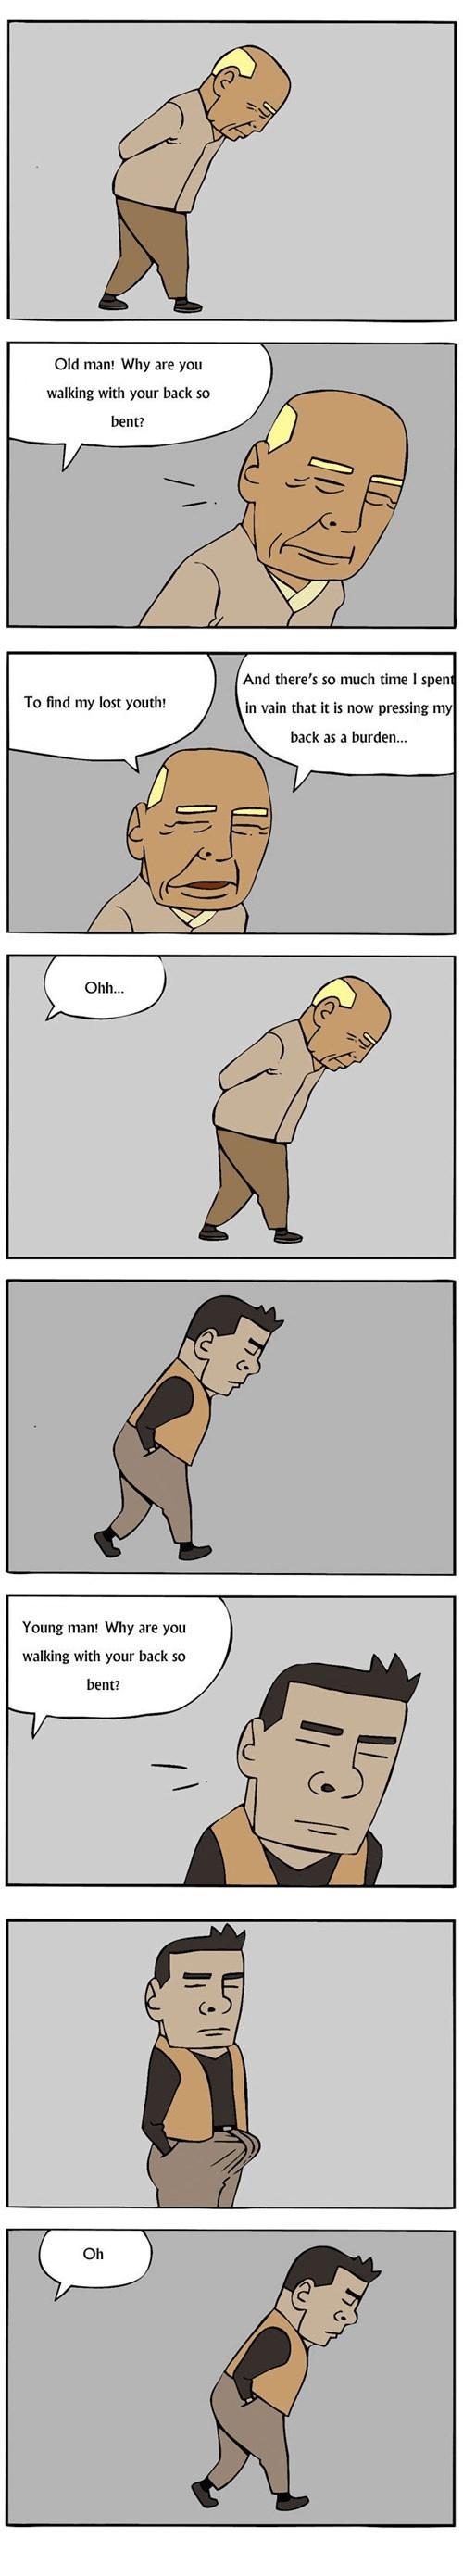 old man sad but true web comics - 8372101120